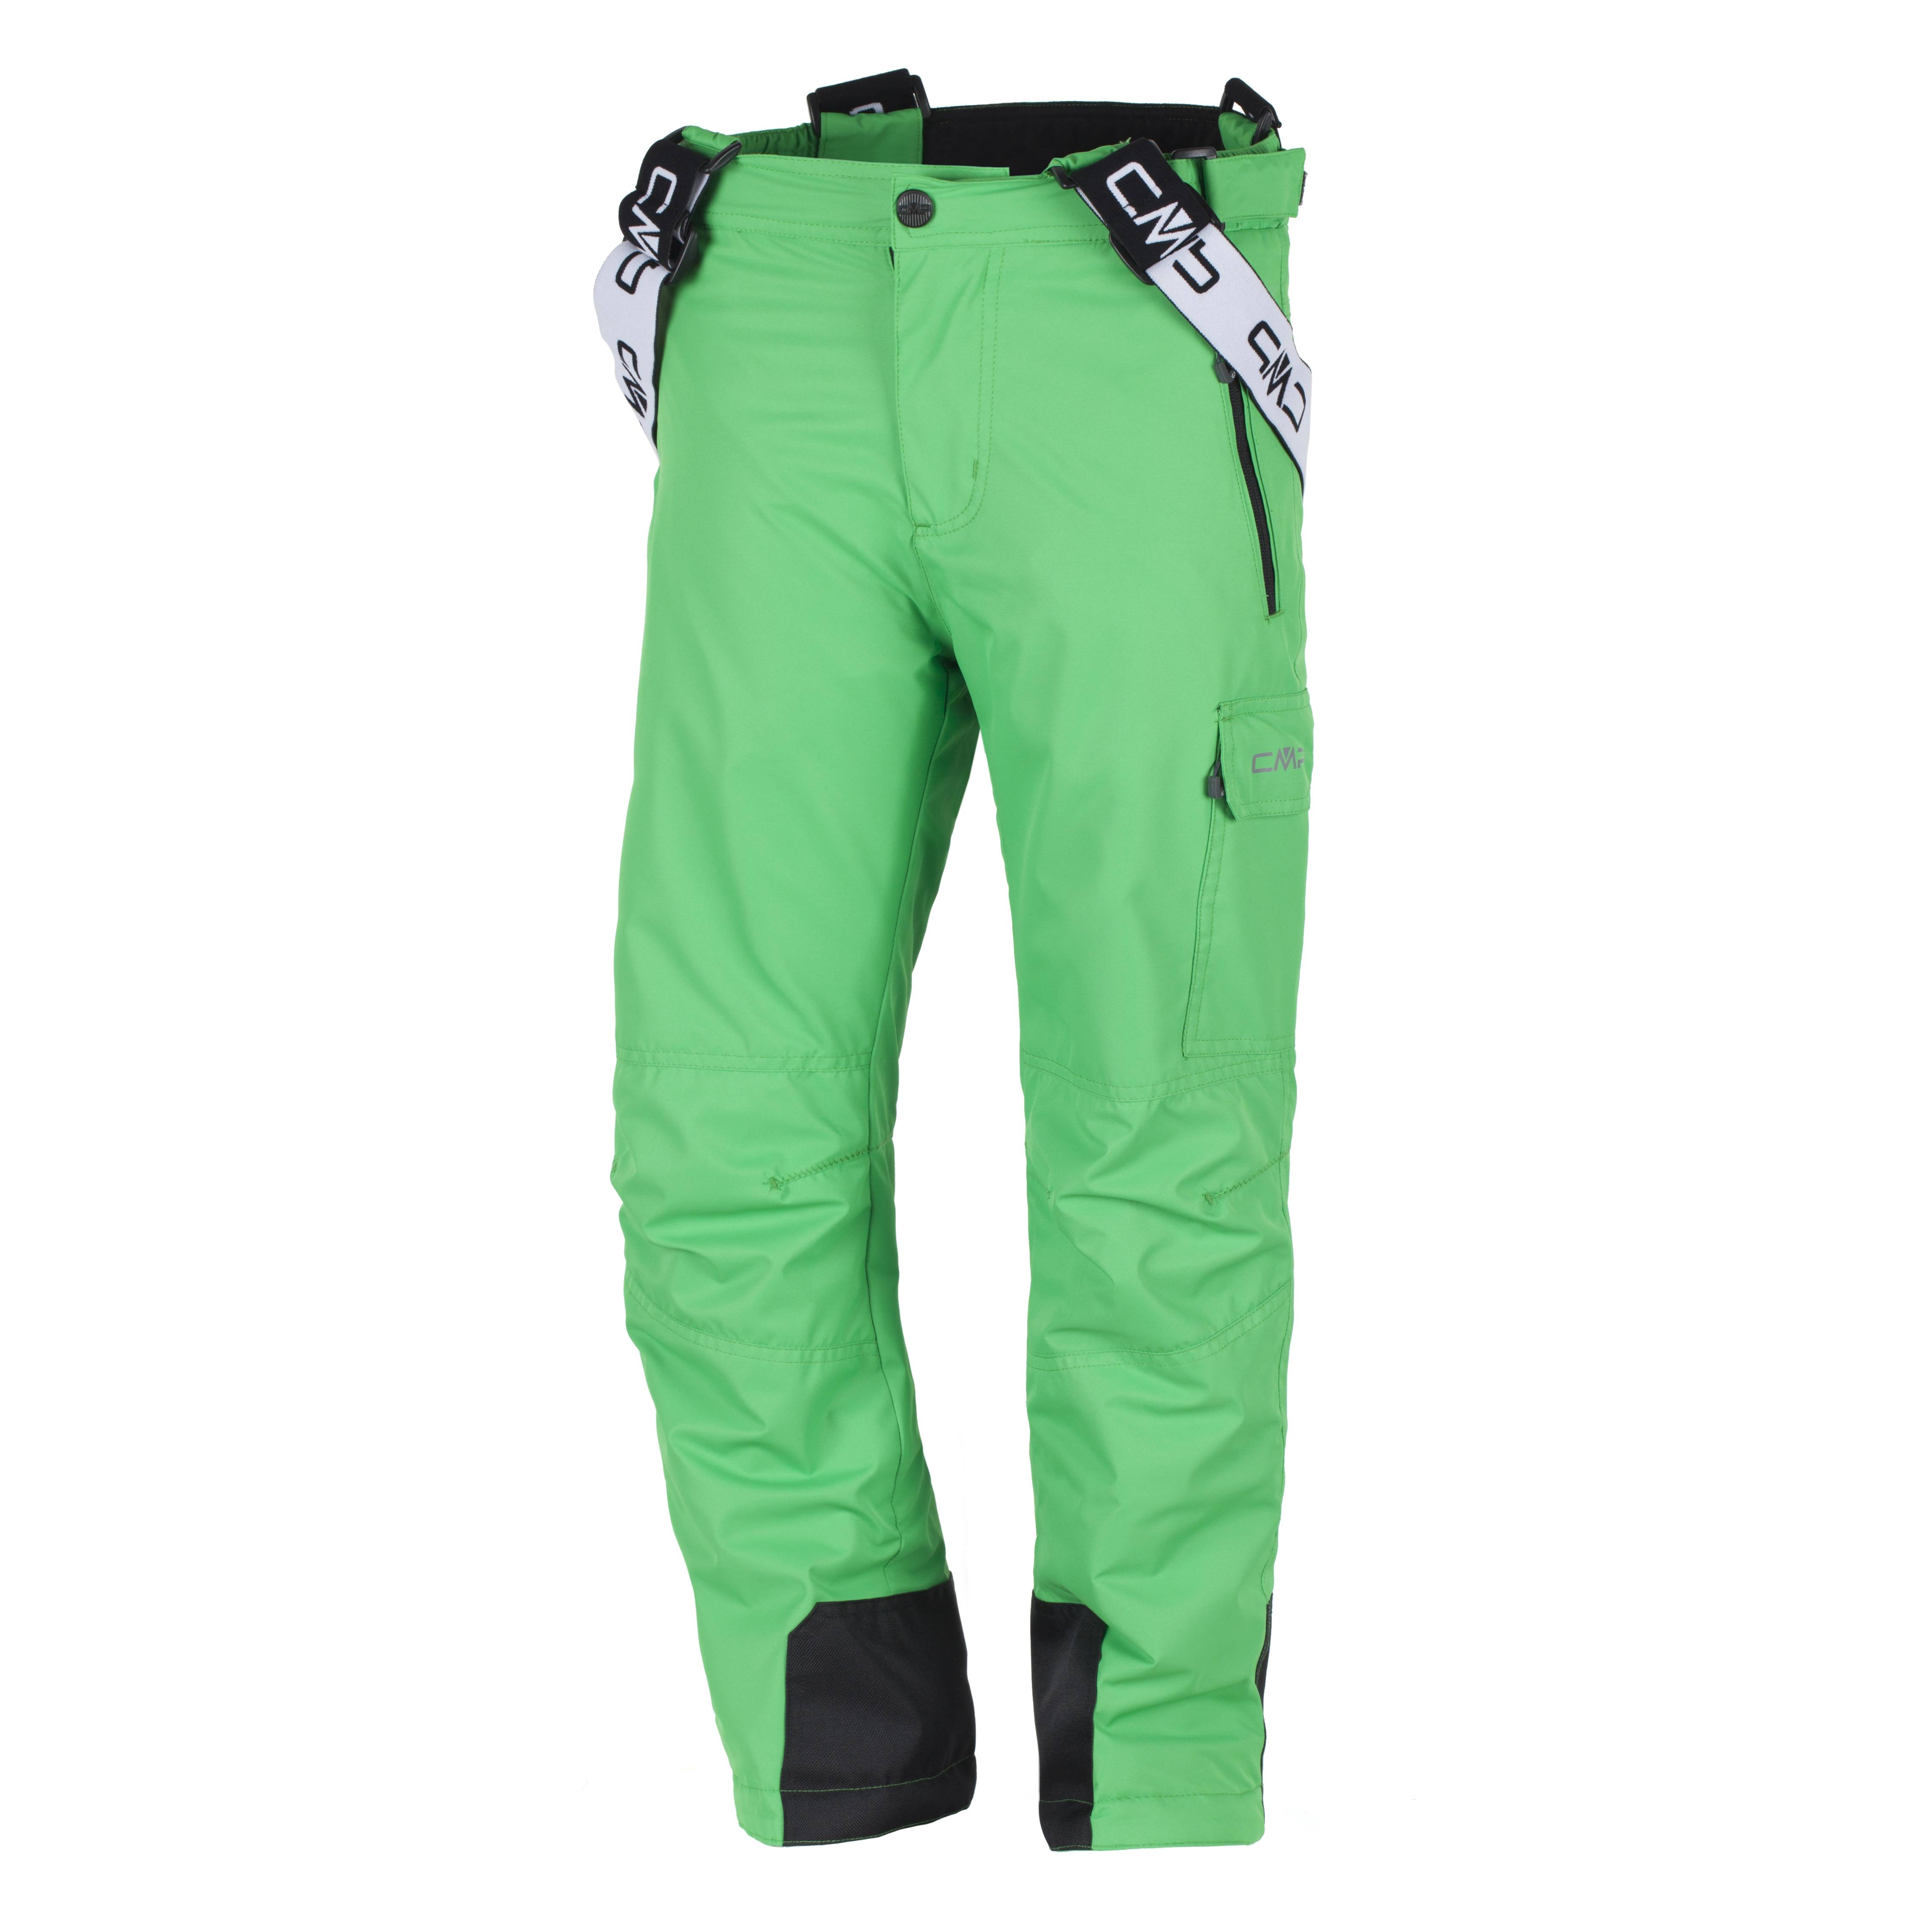 CMP-Pantalones-Esqui-invierno-de-snowboard-verde-ClimaProtect-aislamiento